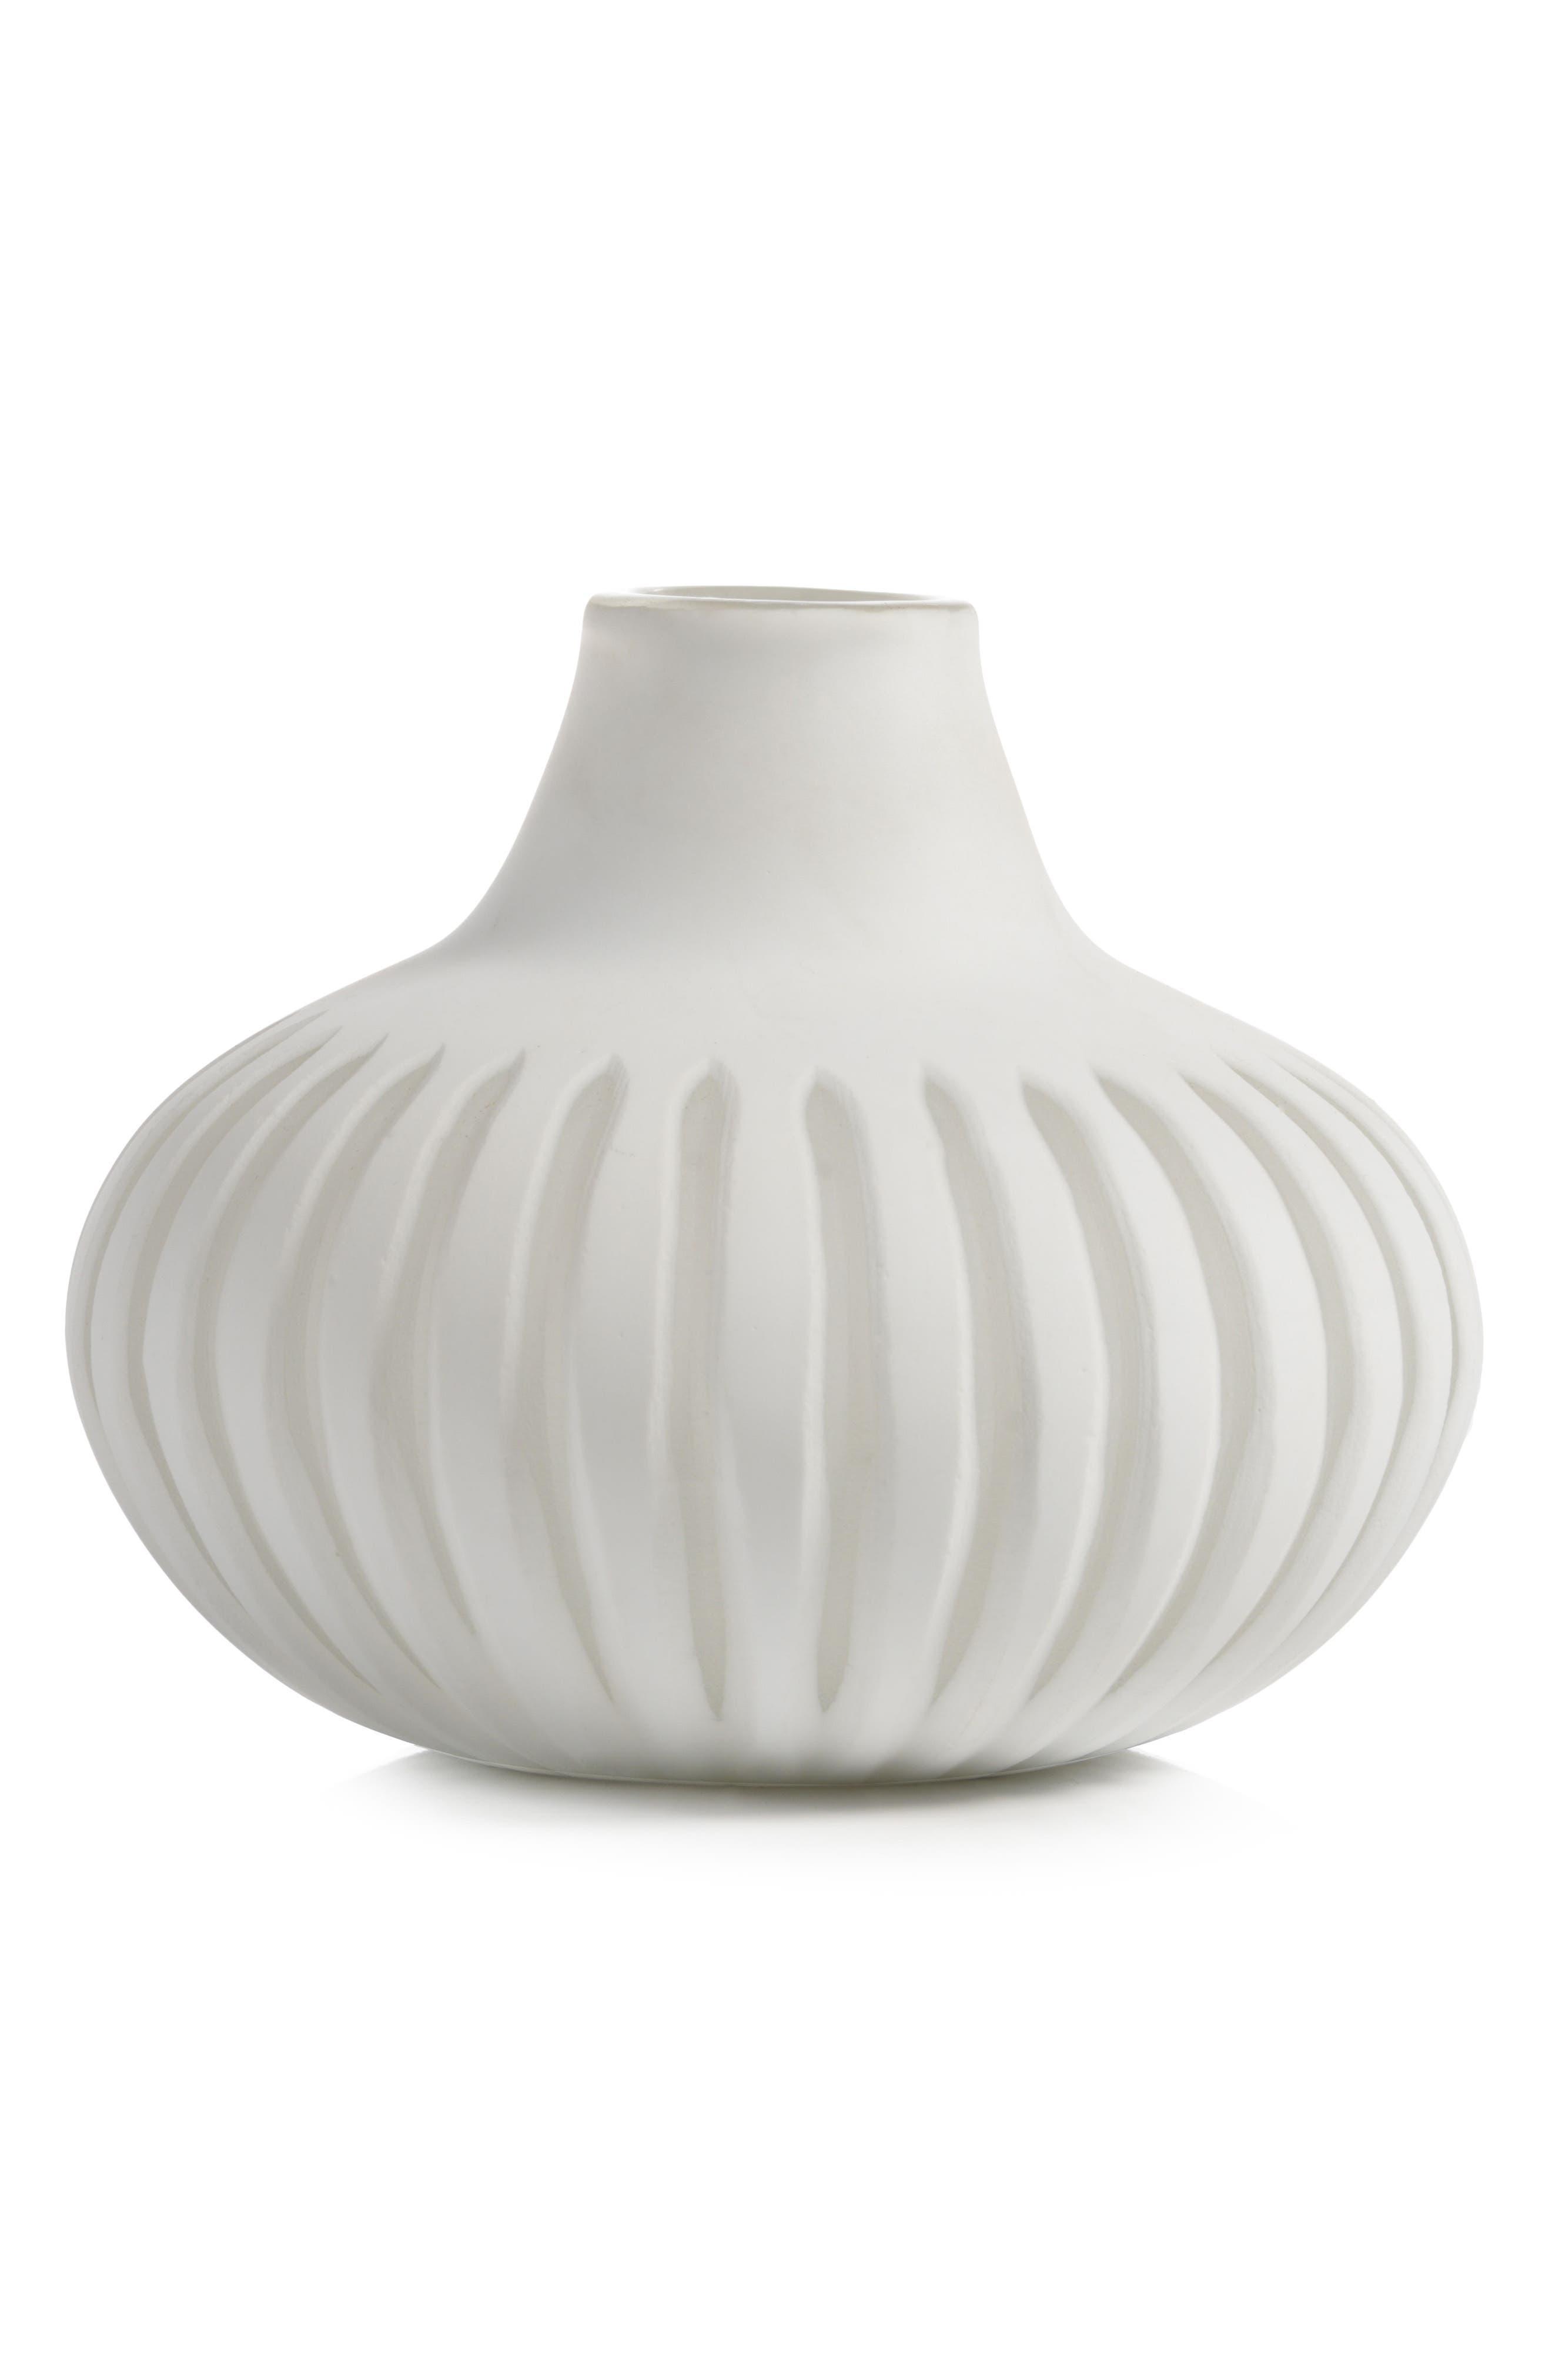 Sakana Glass Vase,                         Main,                         color, White